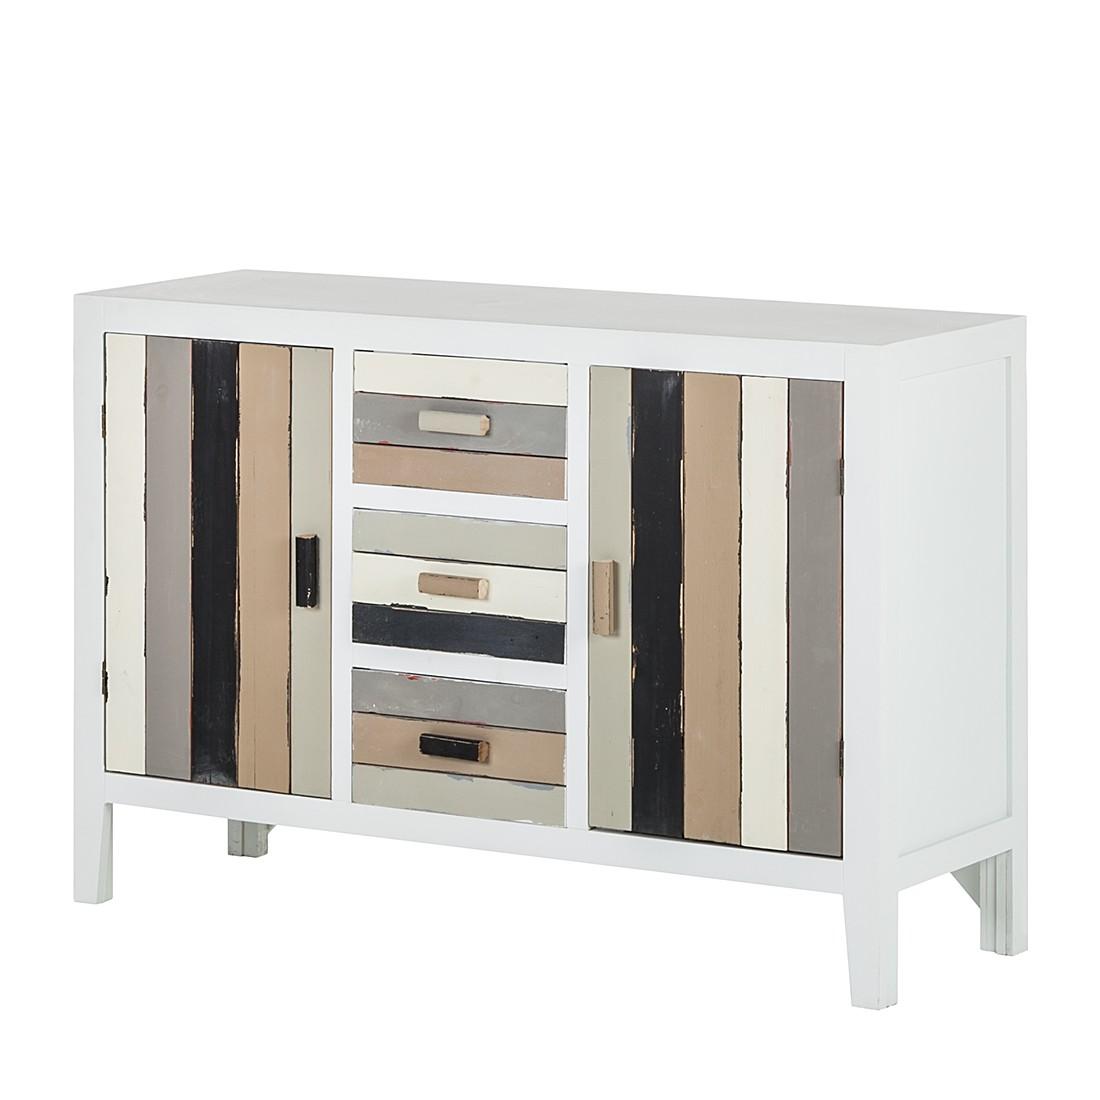 kommode shabby s chic gummibaum teilmassiv. Black Bedroom Furniture Sets. Home Design Ideas